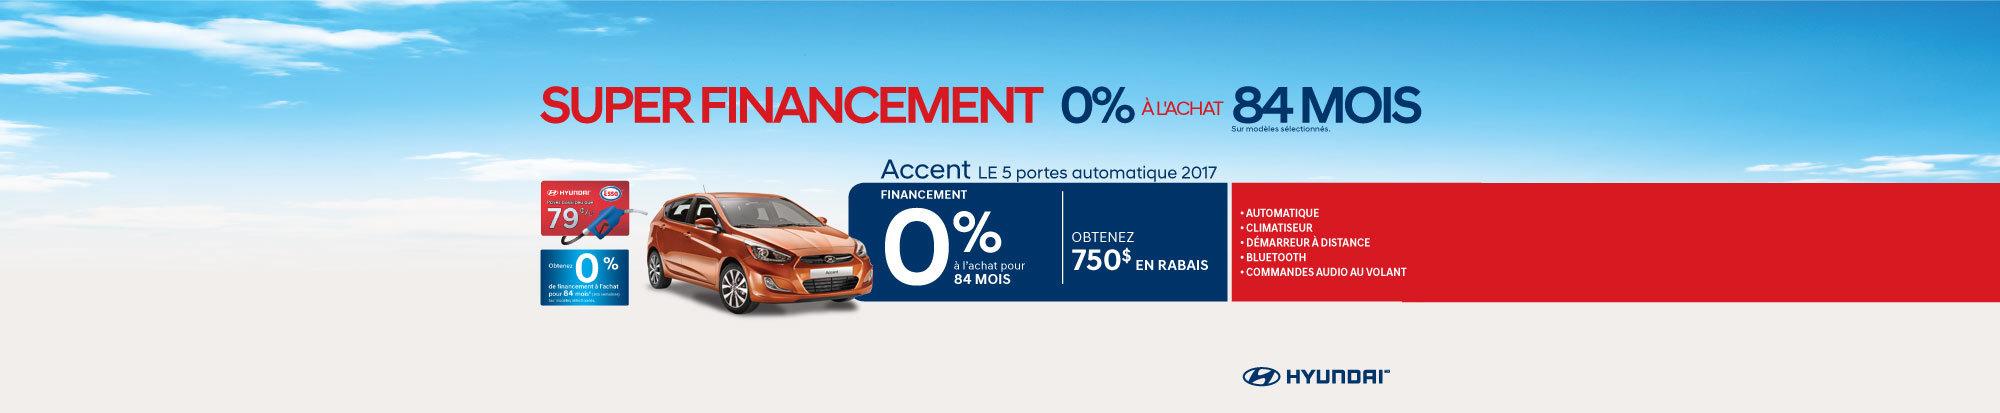 Hyundai Accent 5 portes web